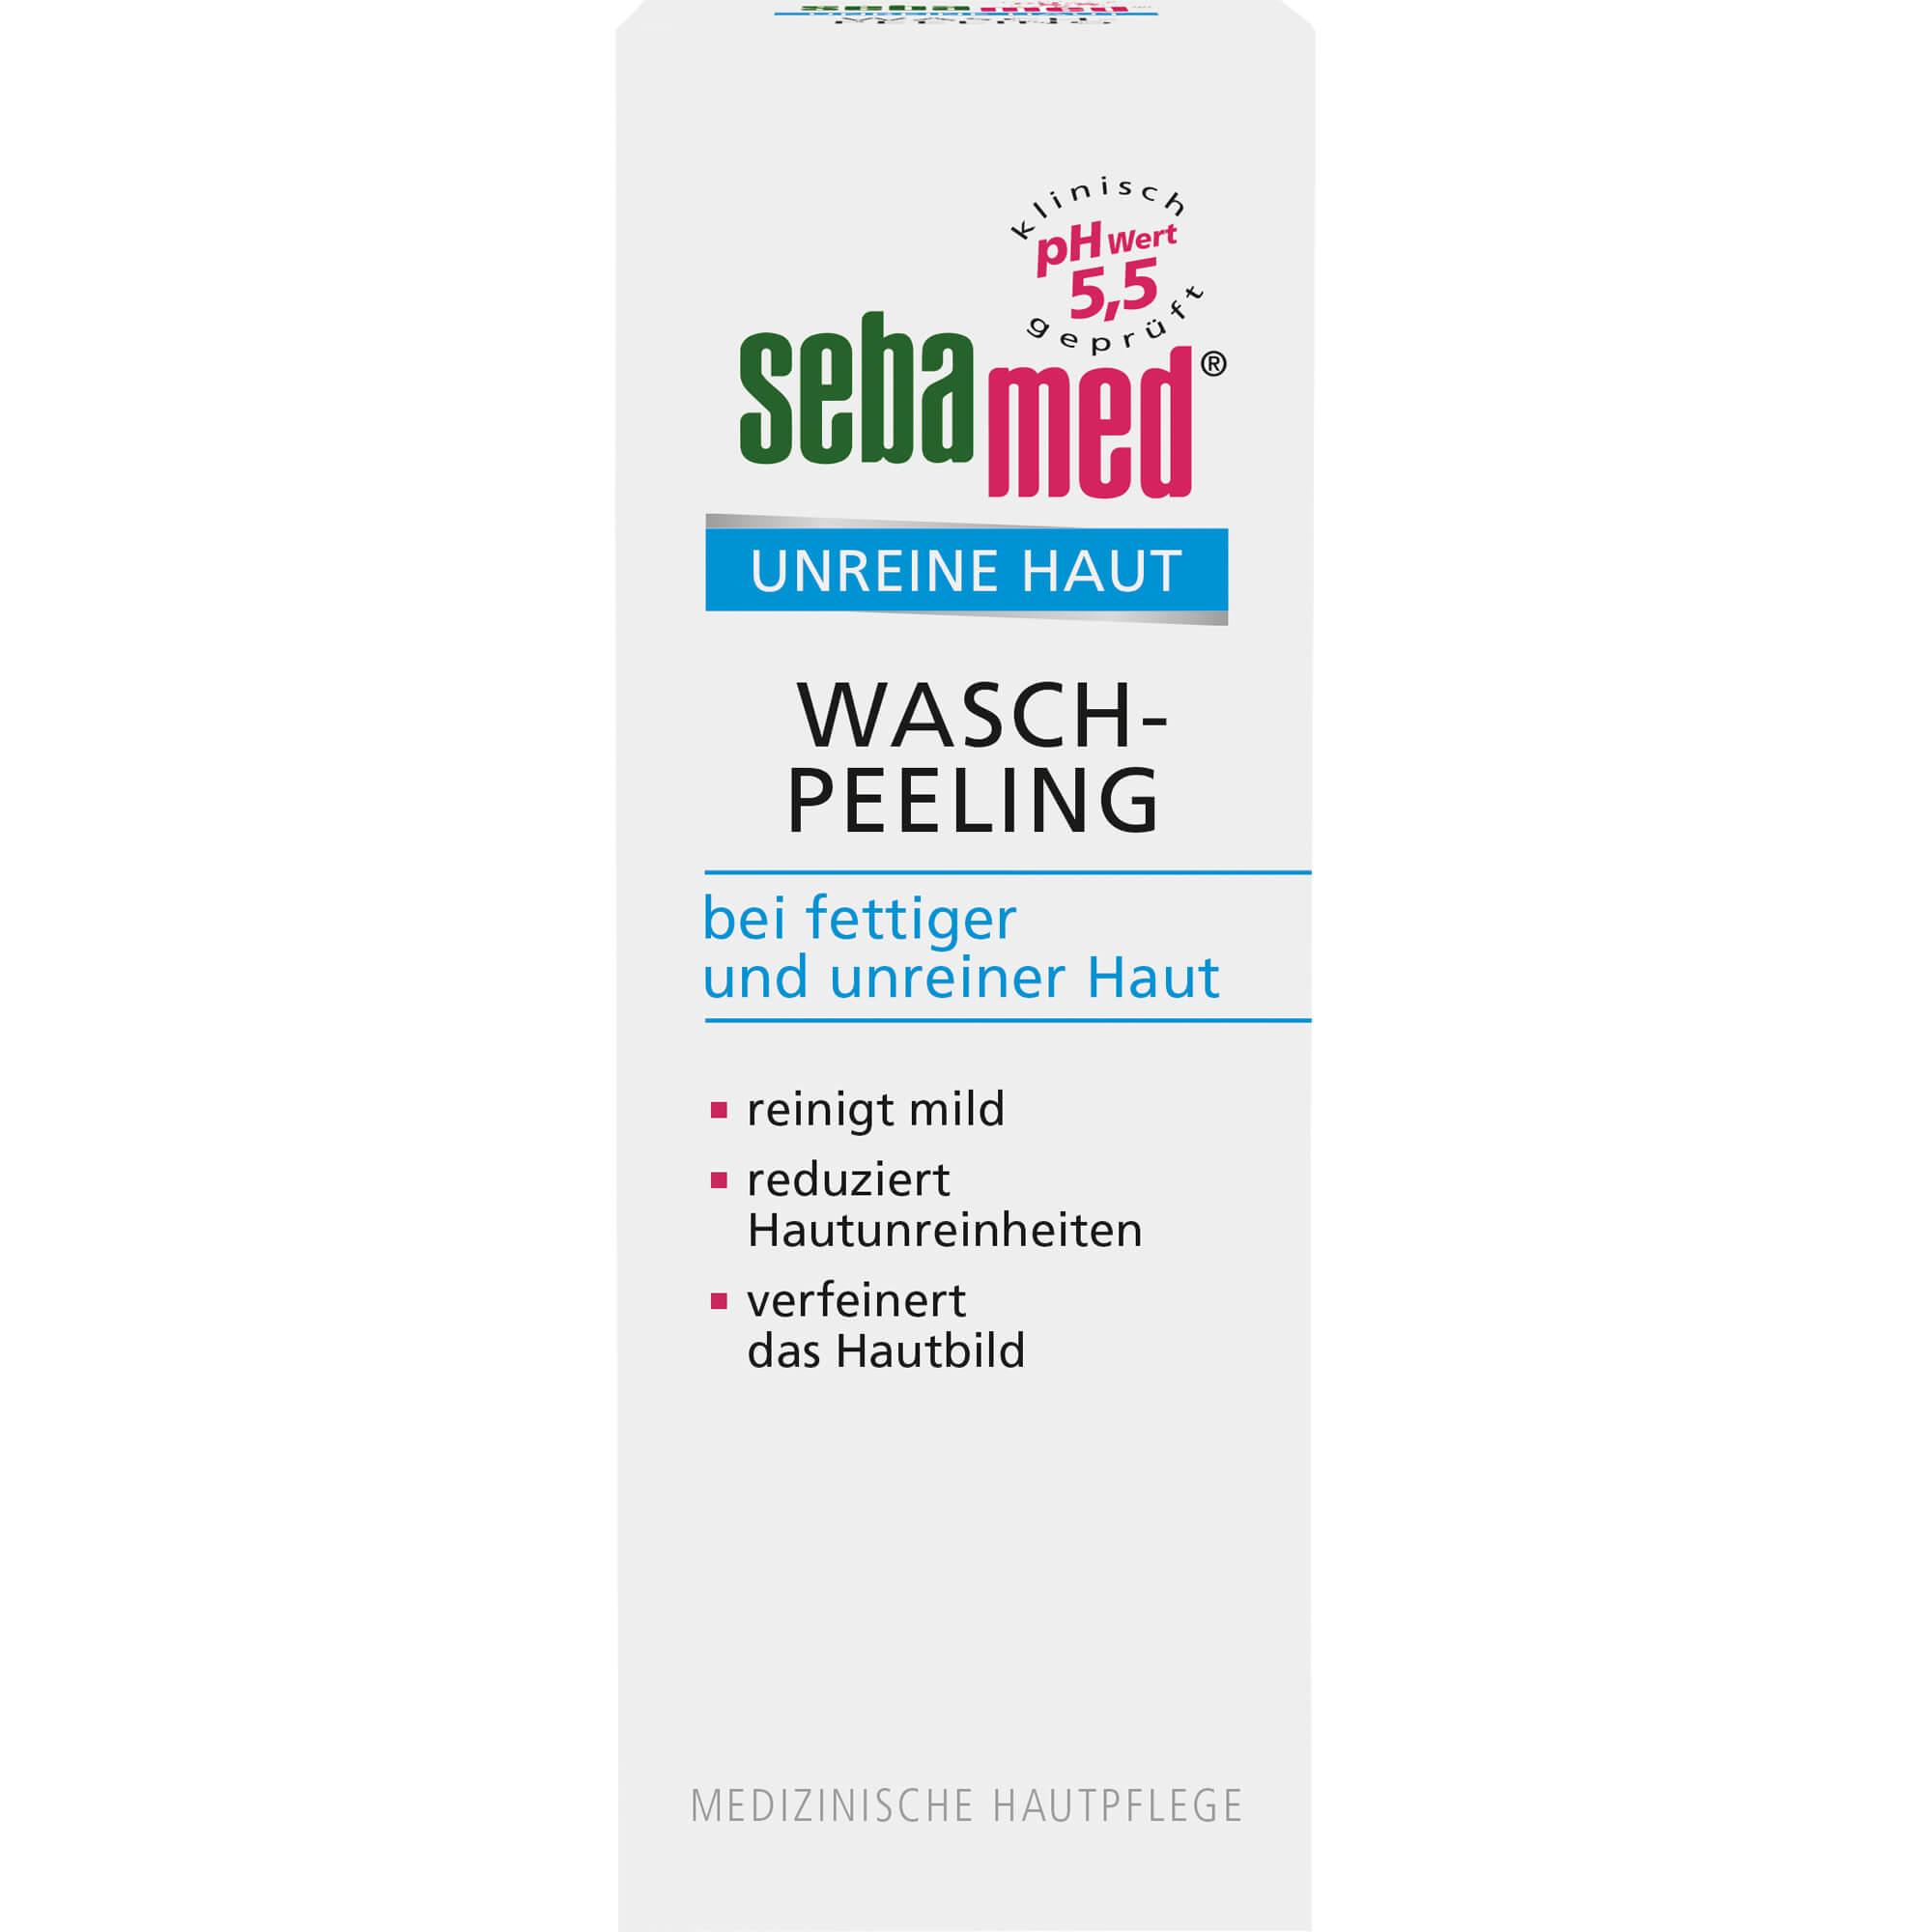 SEBAMED-Unreine-Haut-Wasch-Peeling